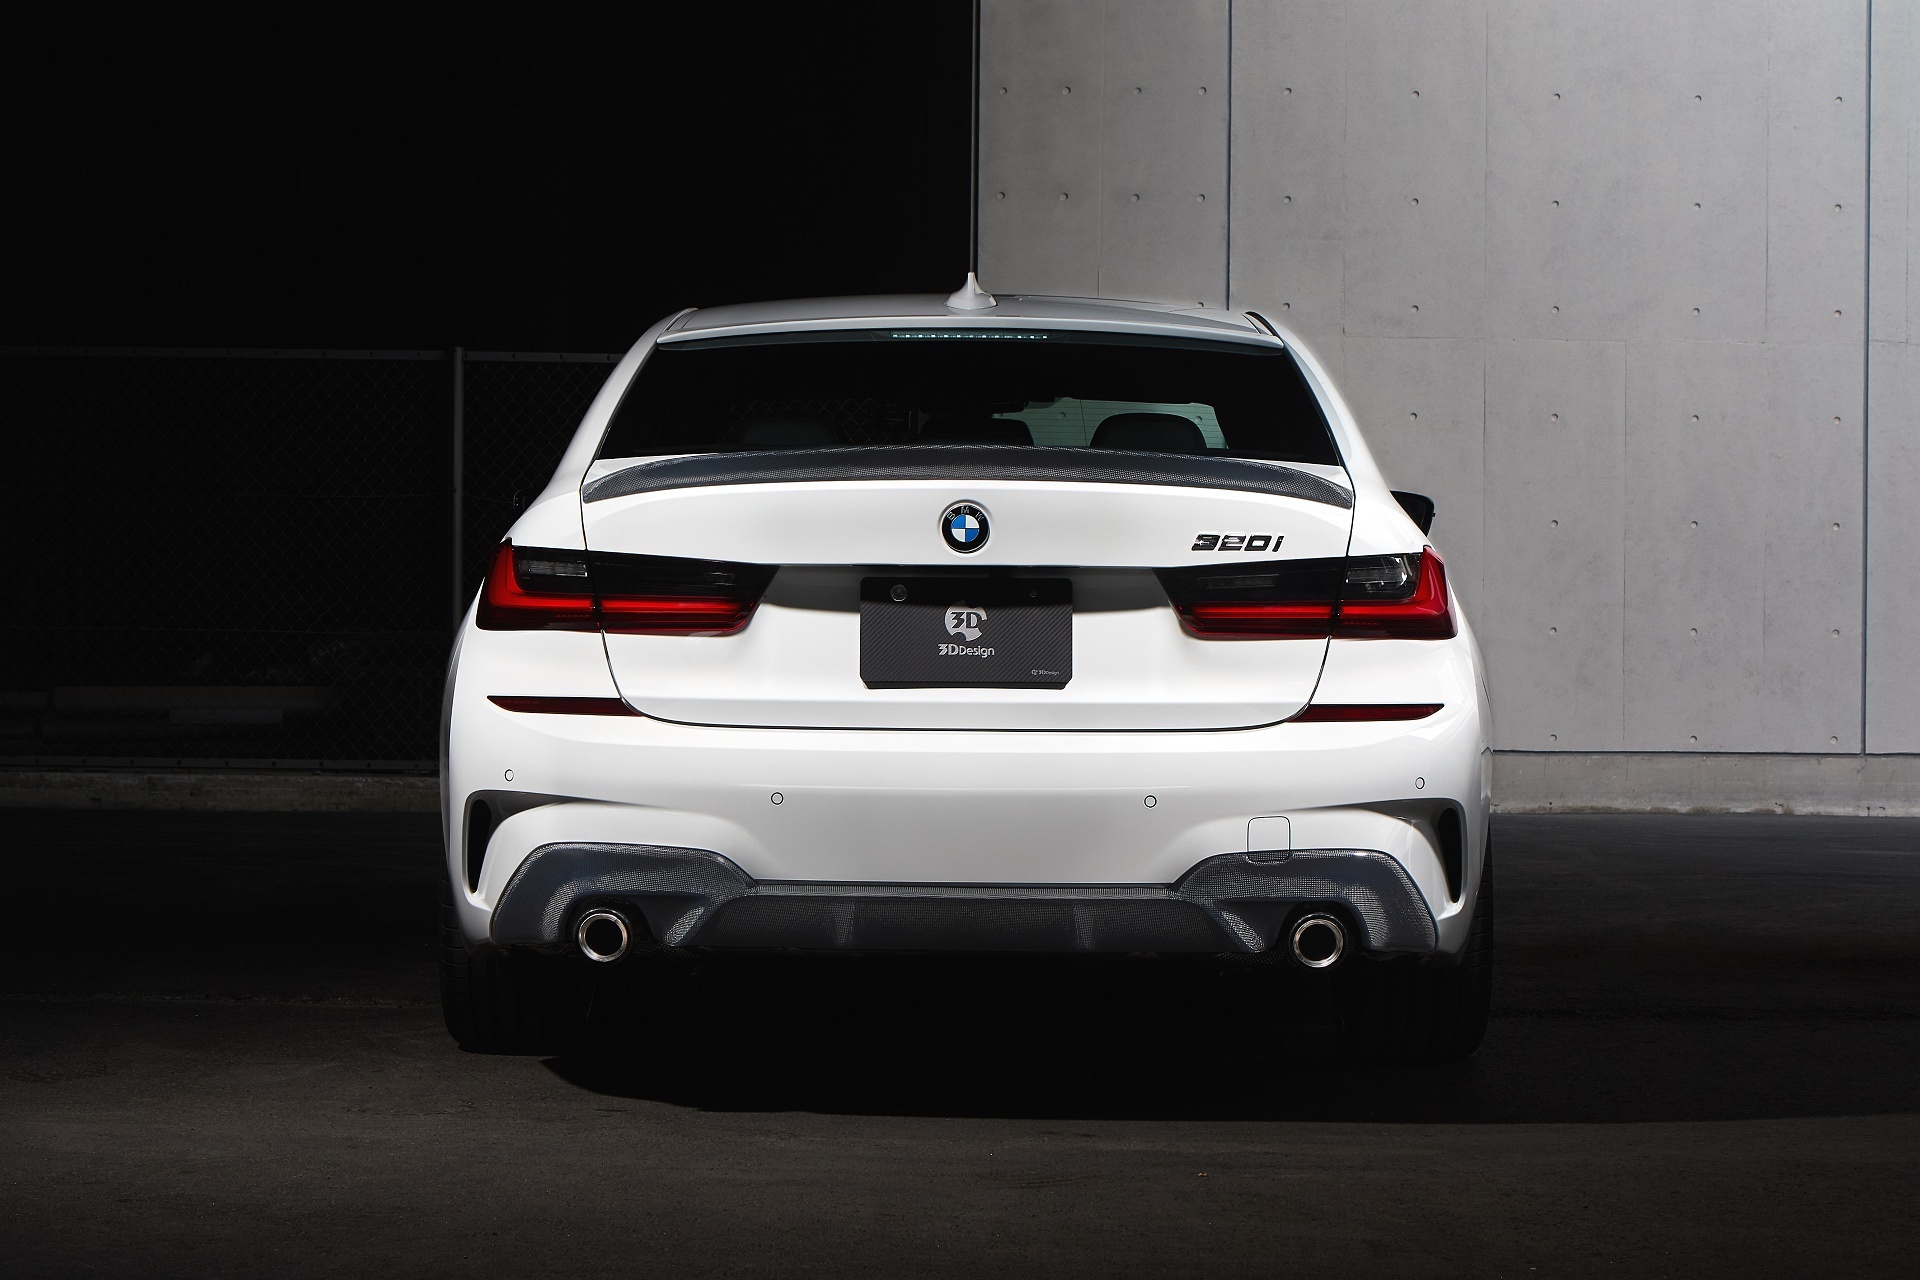 BMW-3-Series-by-3D-Design-10